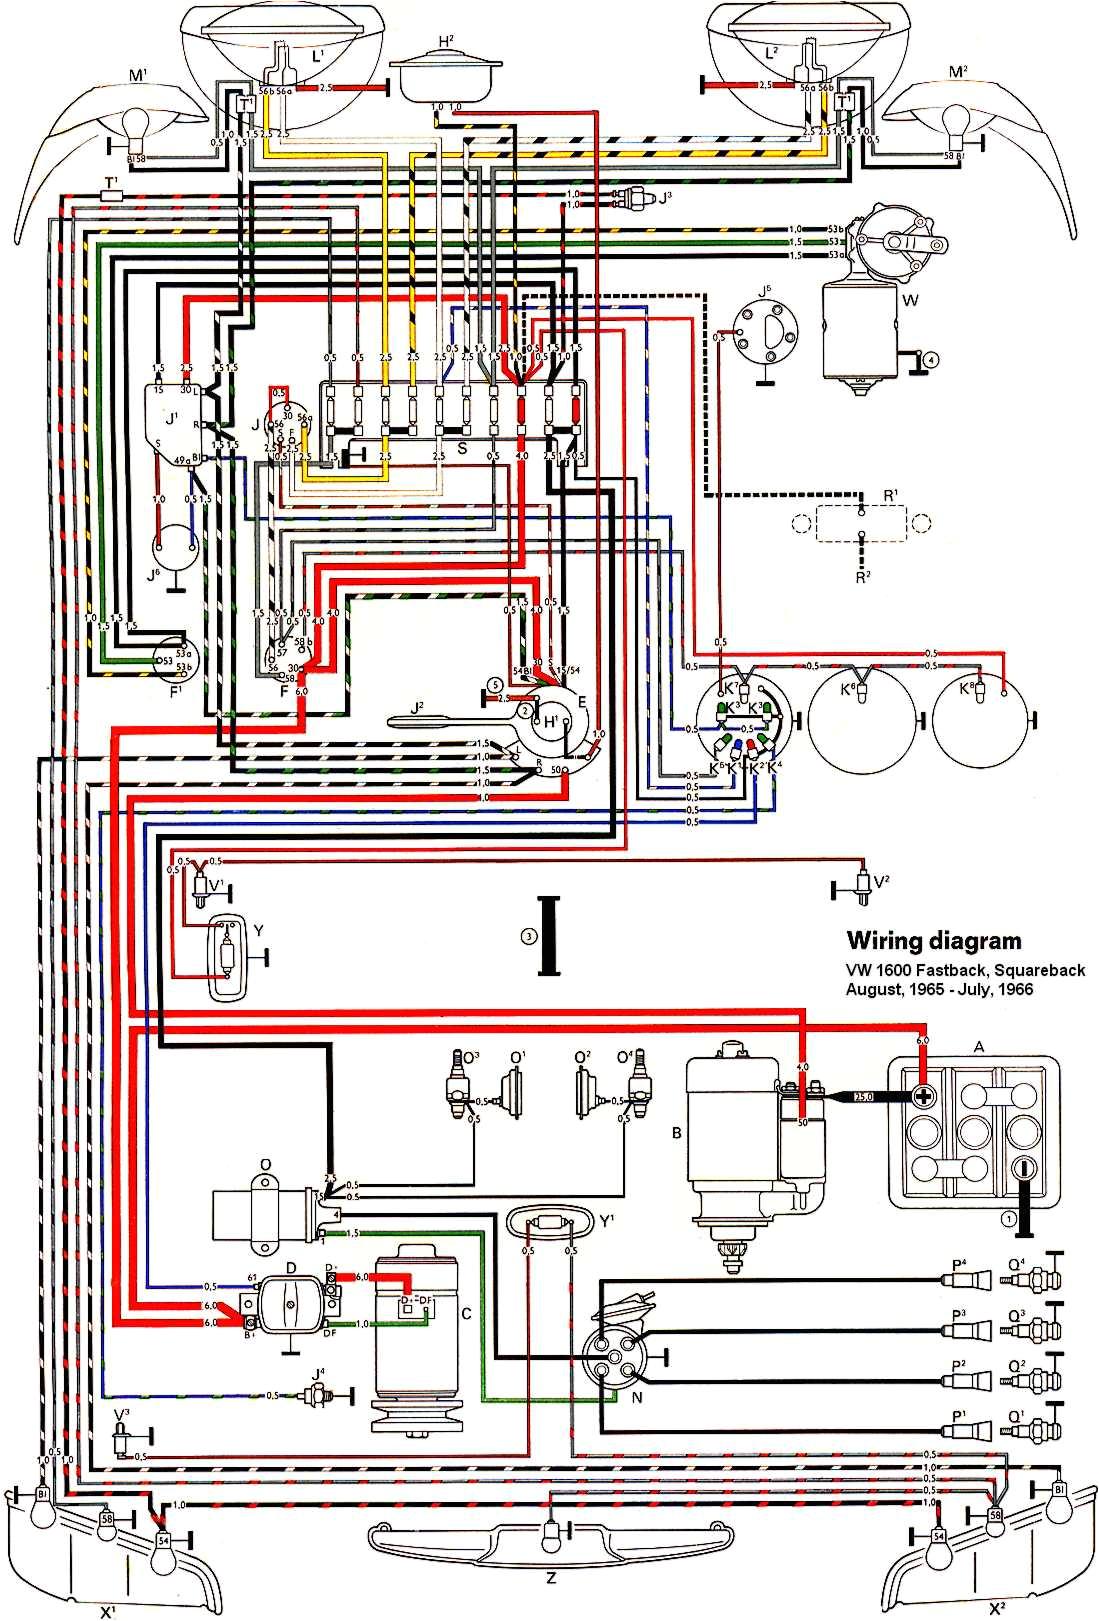 73 vw wiring diagrams wiring diagram centre 73 vw beetle wiring diagram 73 beetle wiring diagram